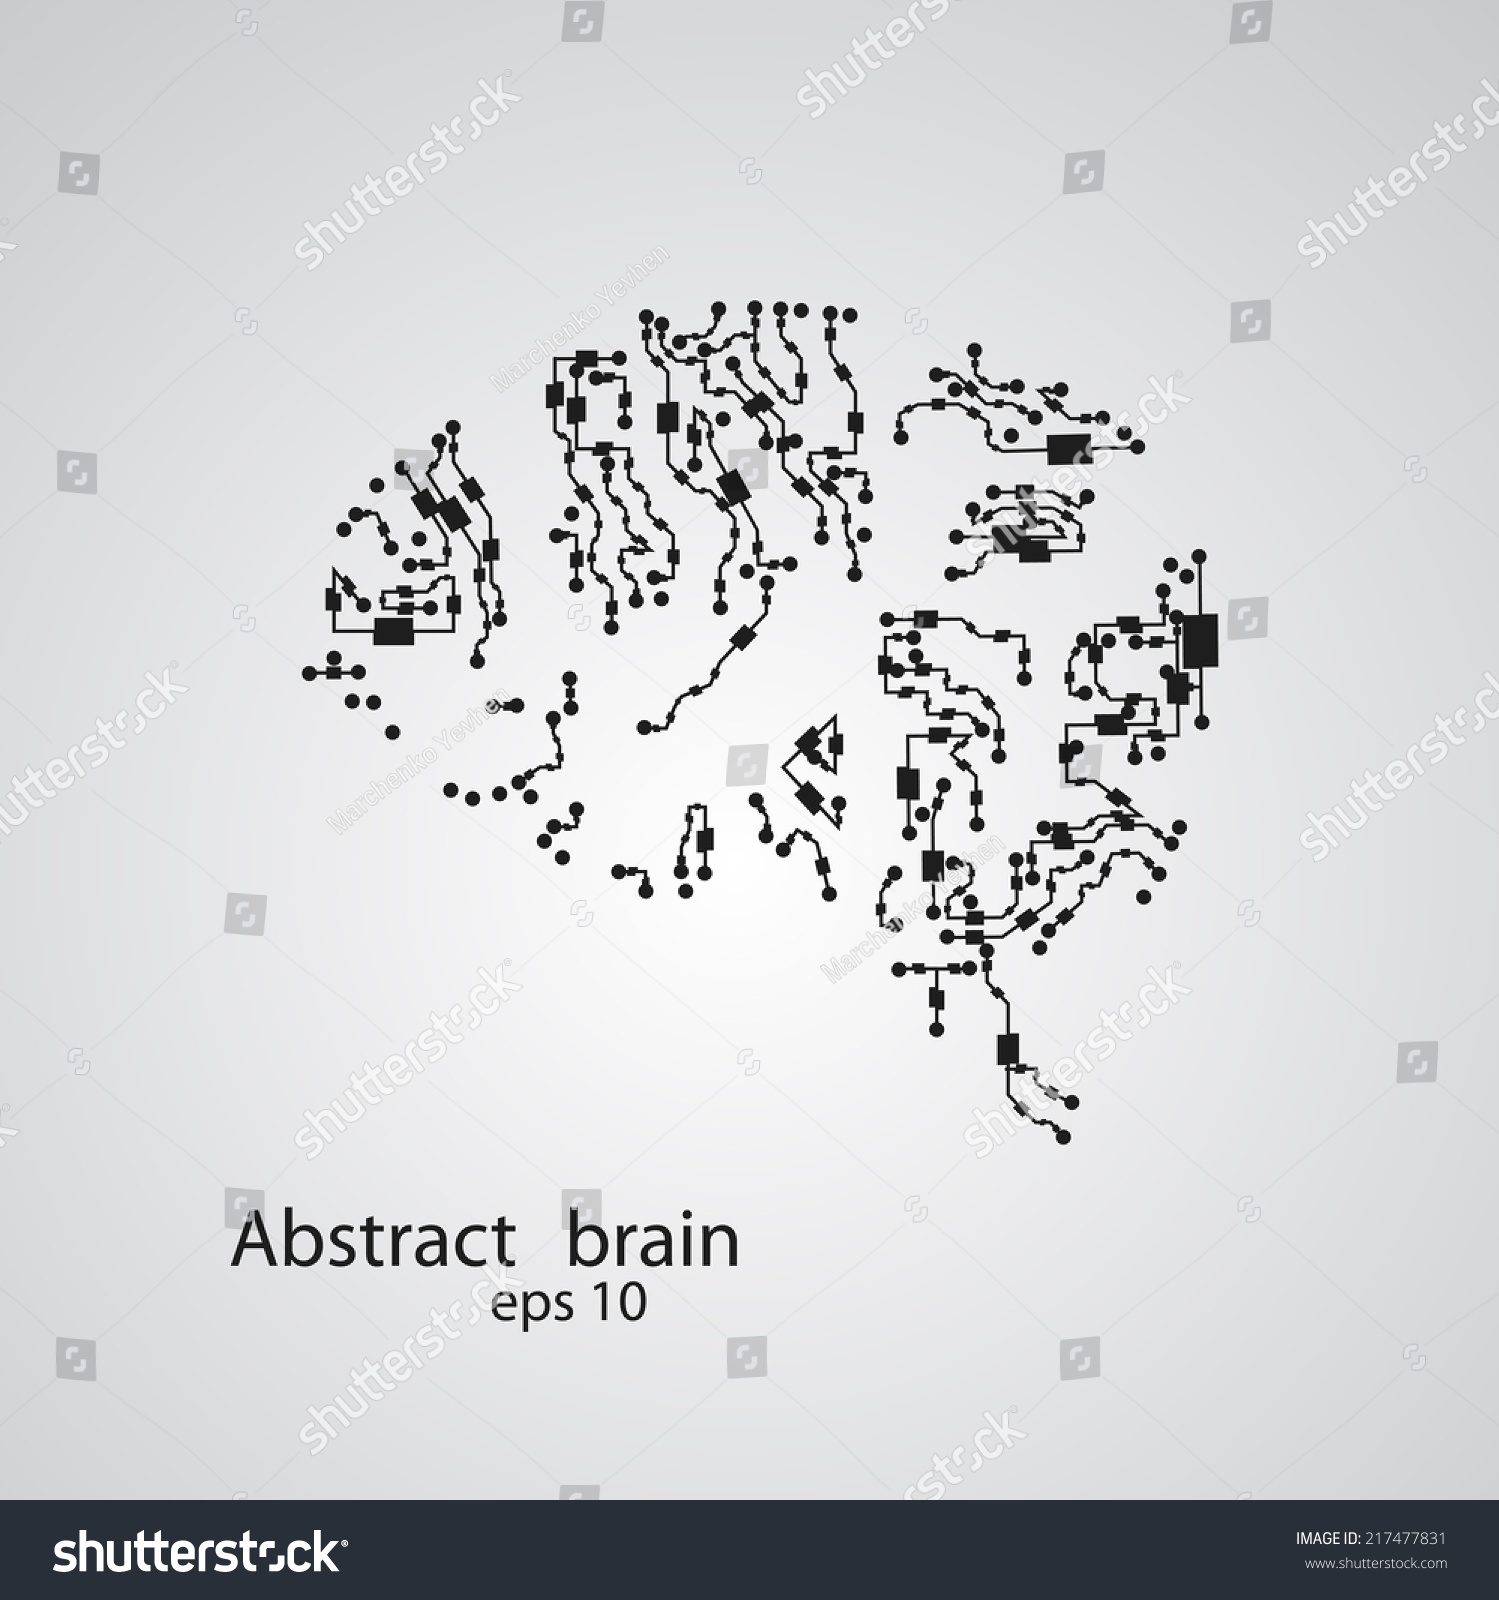 Circuit Board Brain Eps 10 Vector Stock Royalty Free Illustration Image